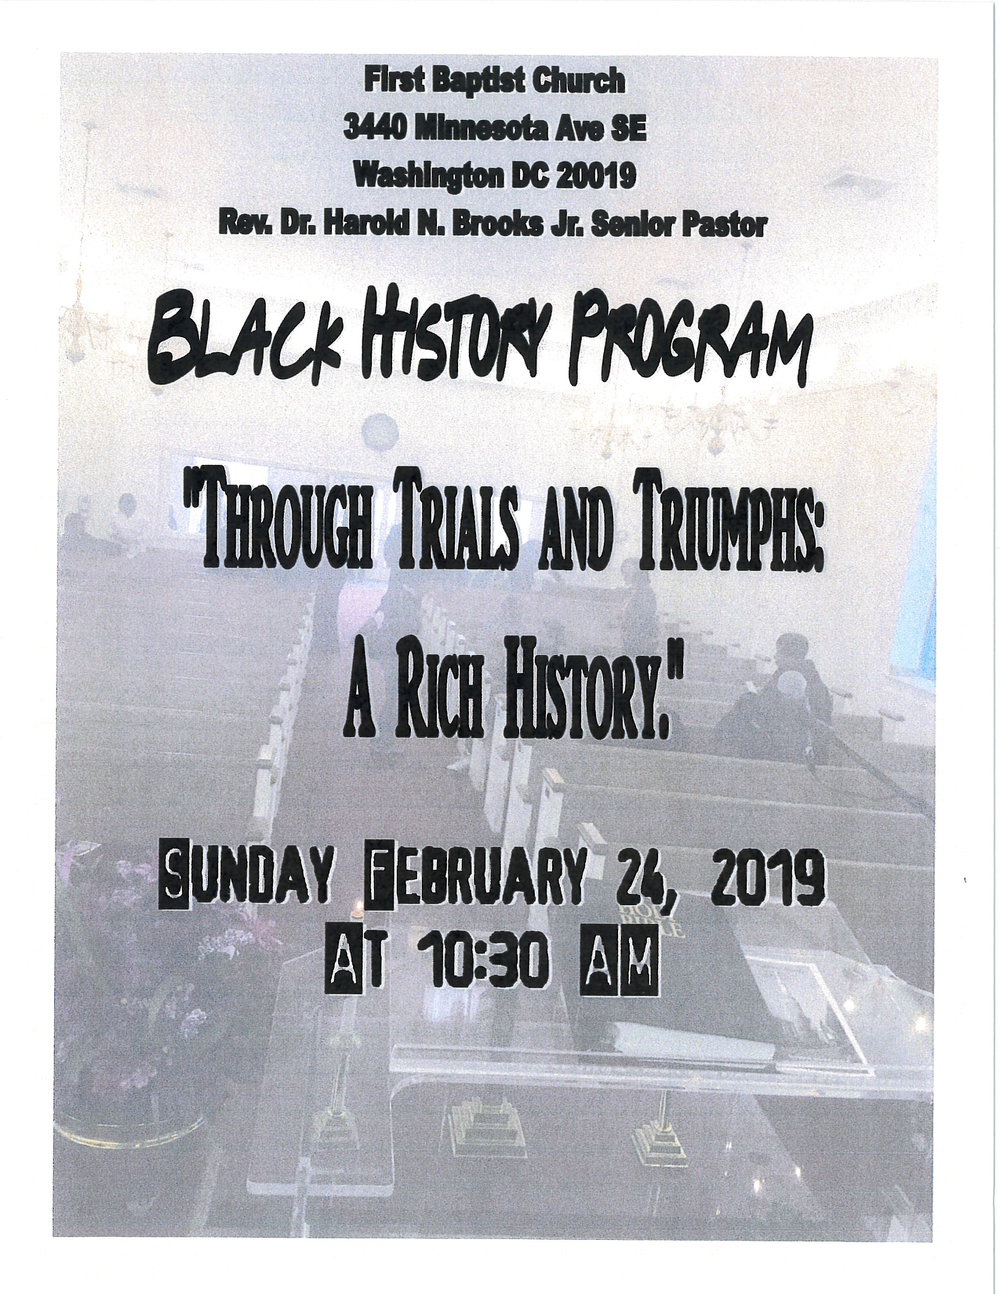 FBC Black History Program Flyer.jpg